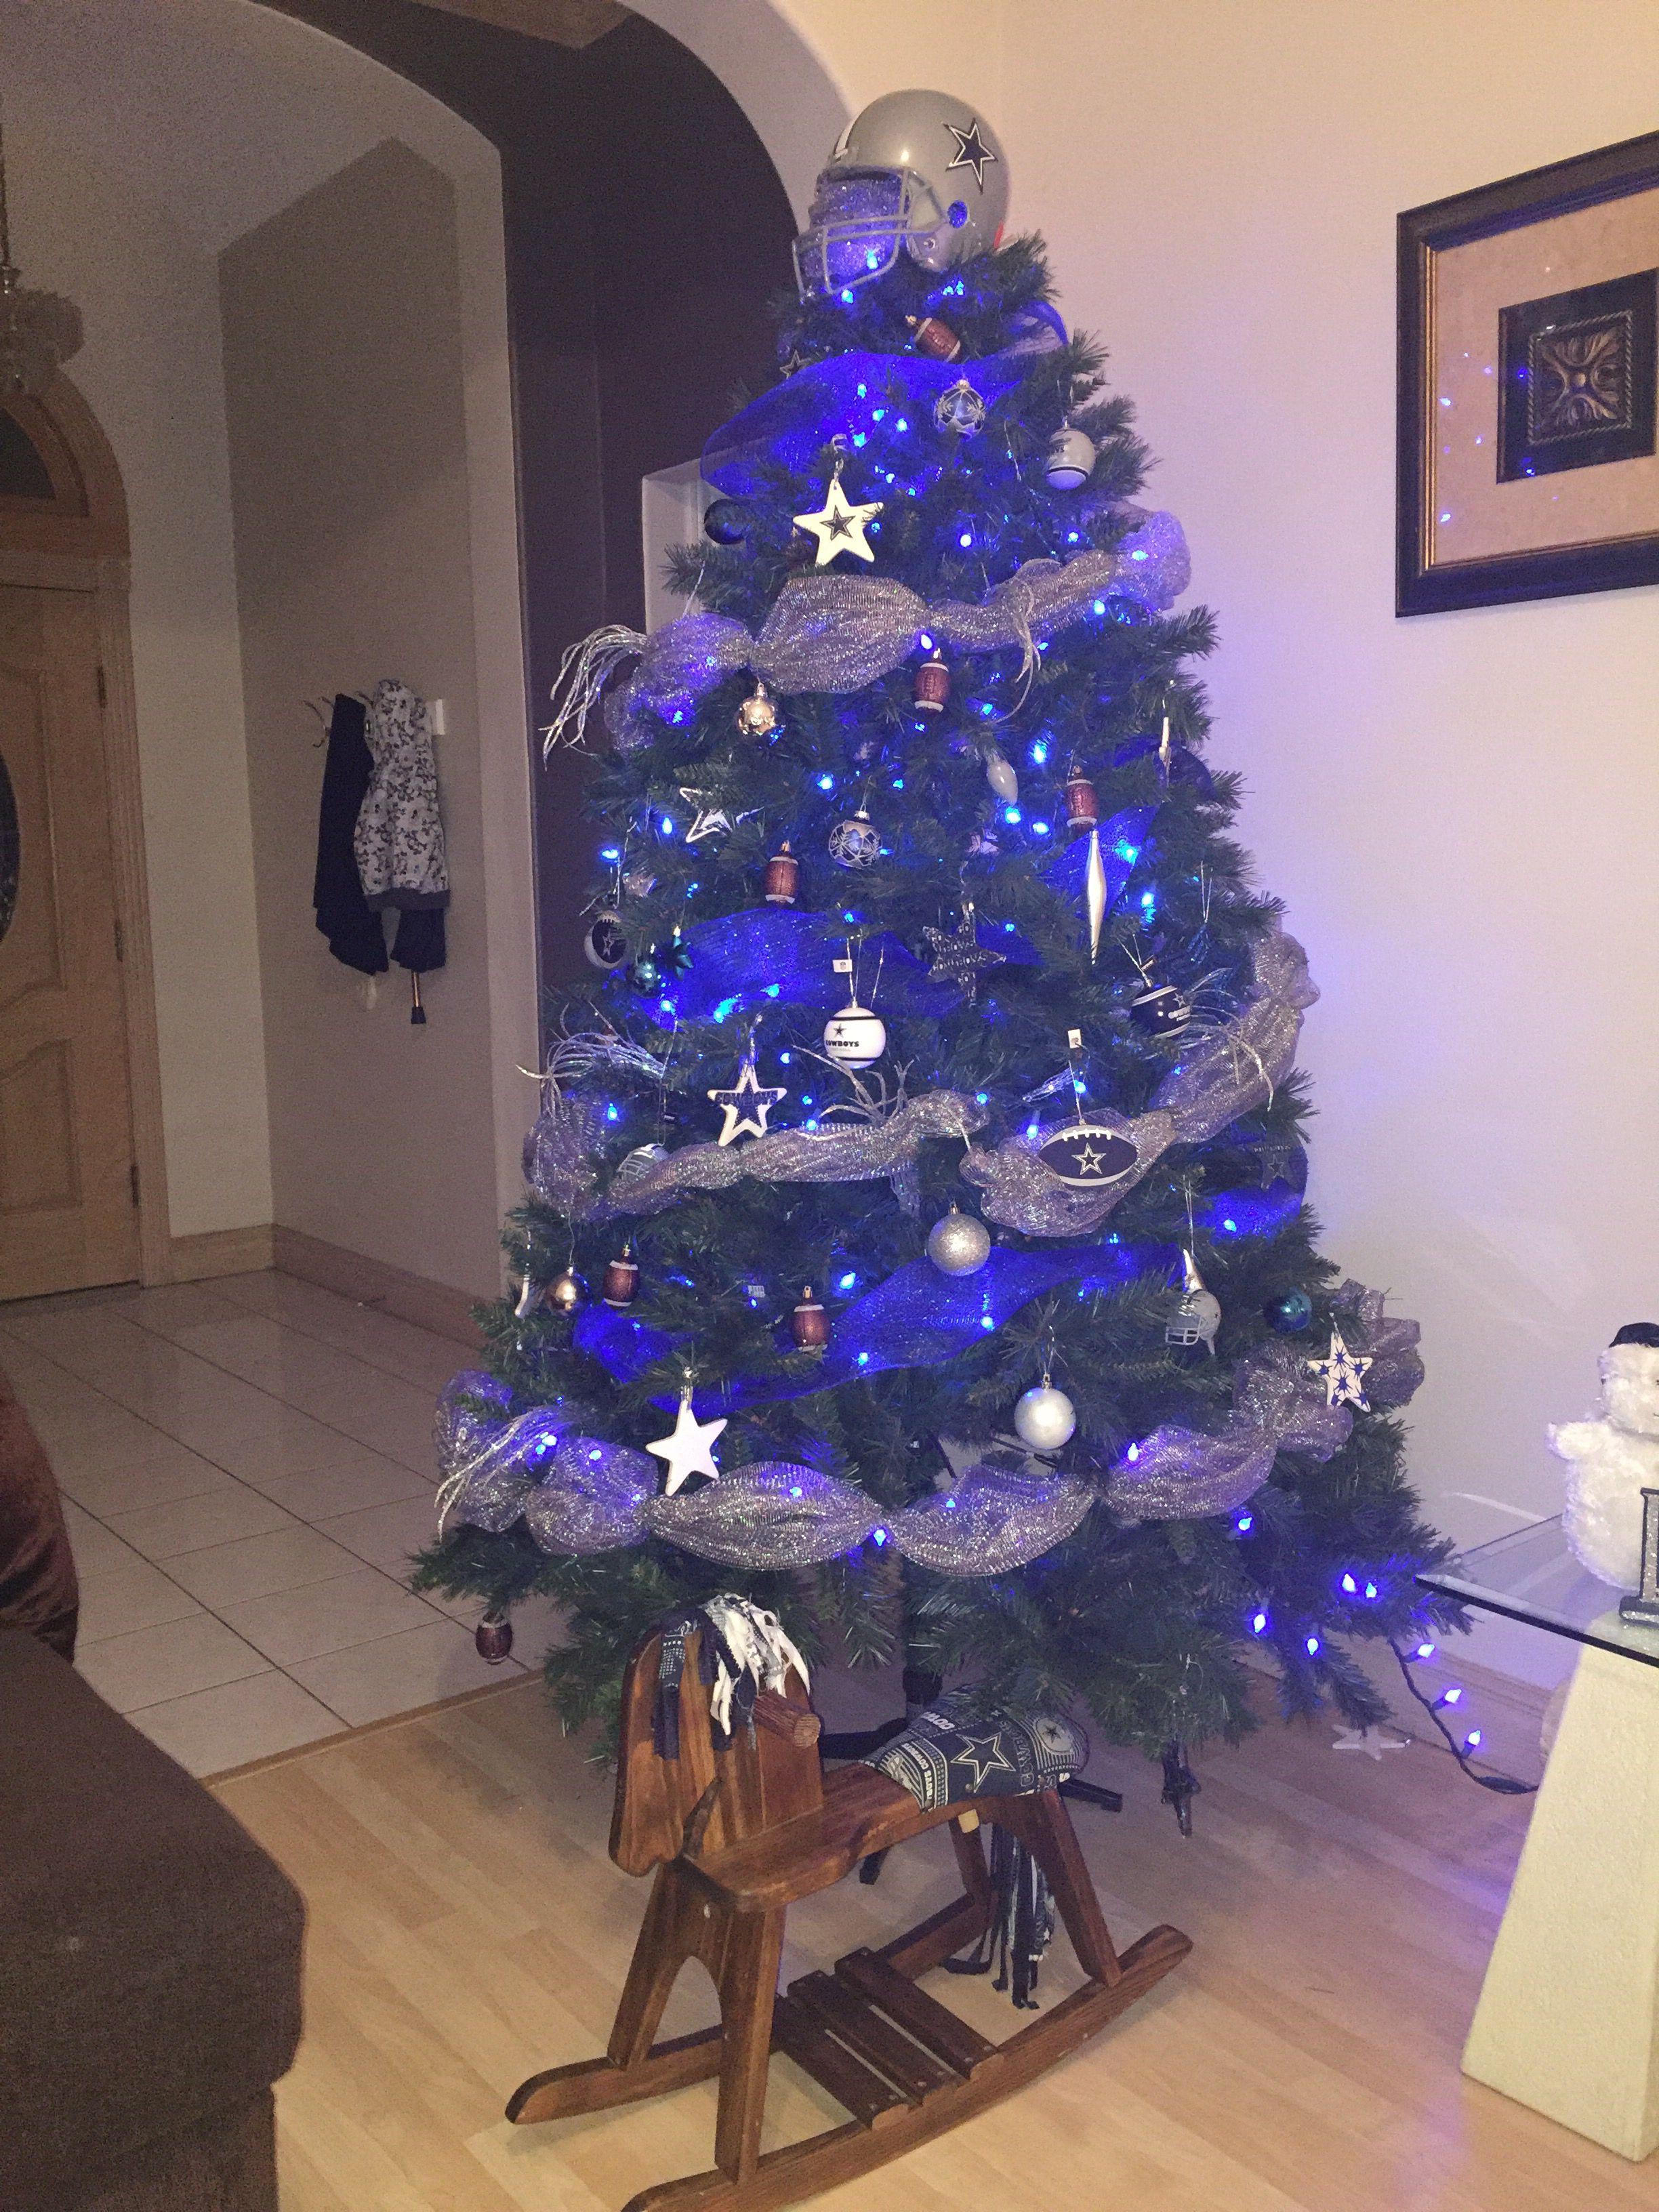 dallas cowboys themed christmas tree christmas door decorations christmas tree themes cowboy christmas